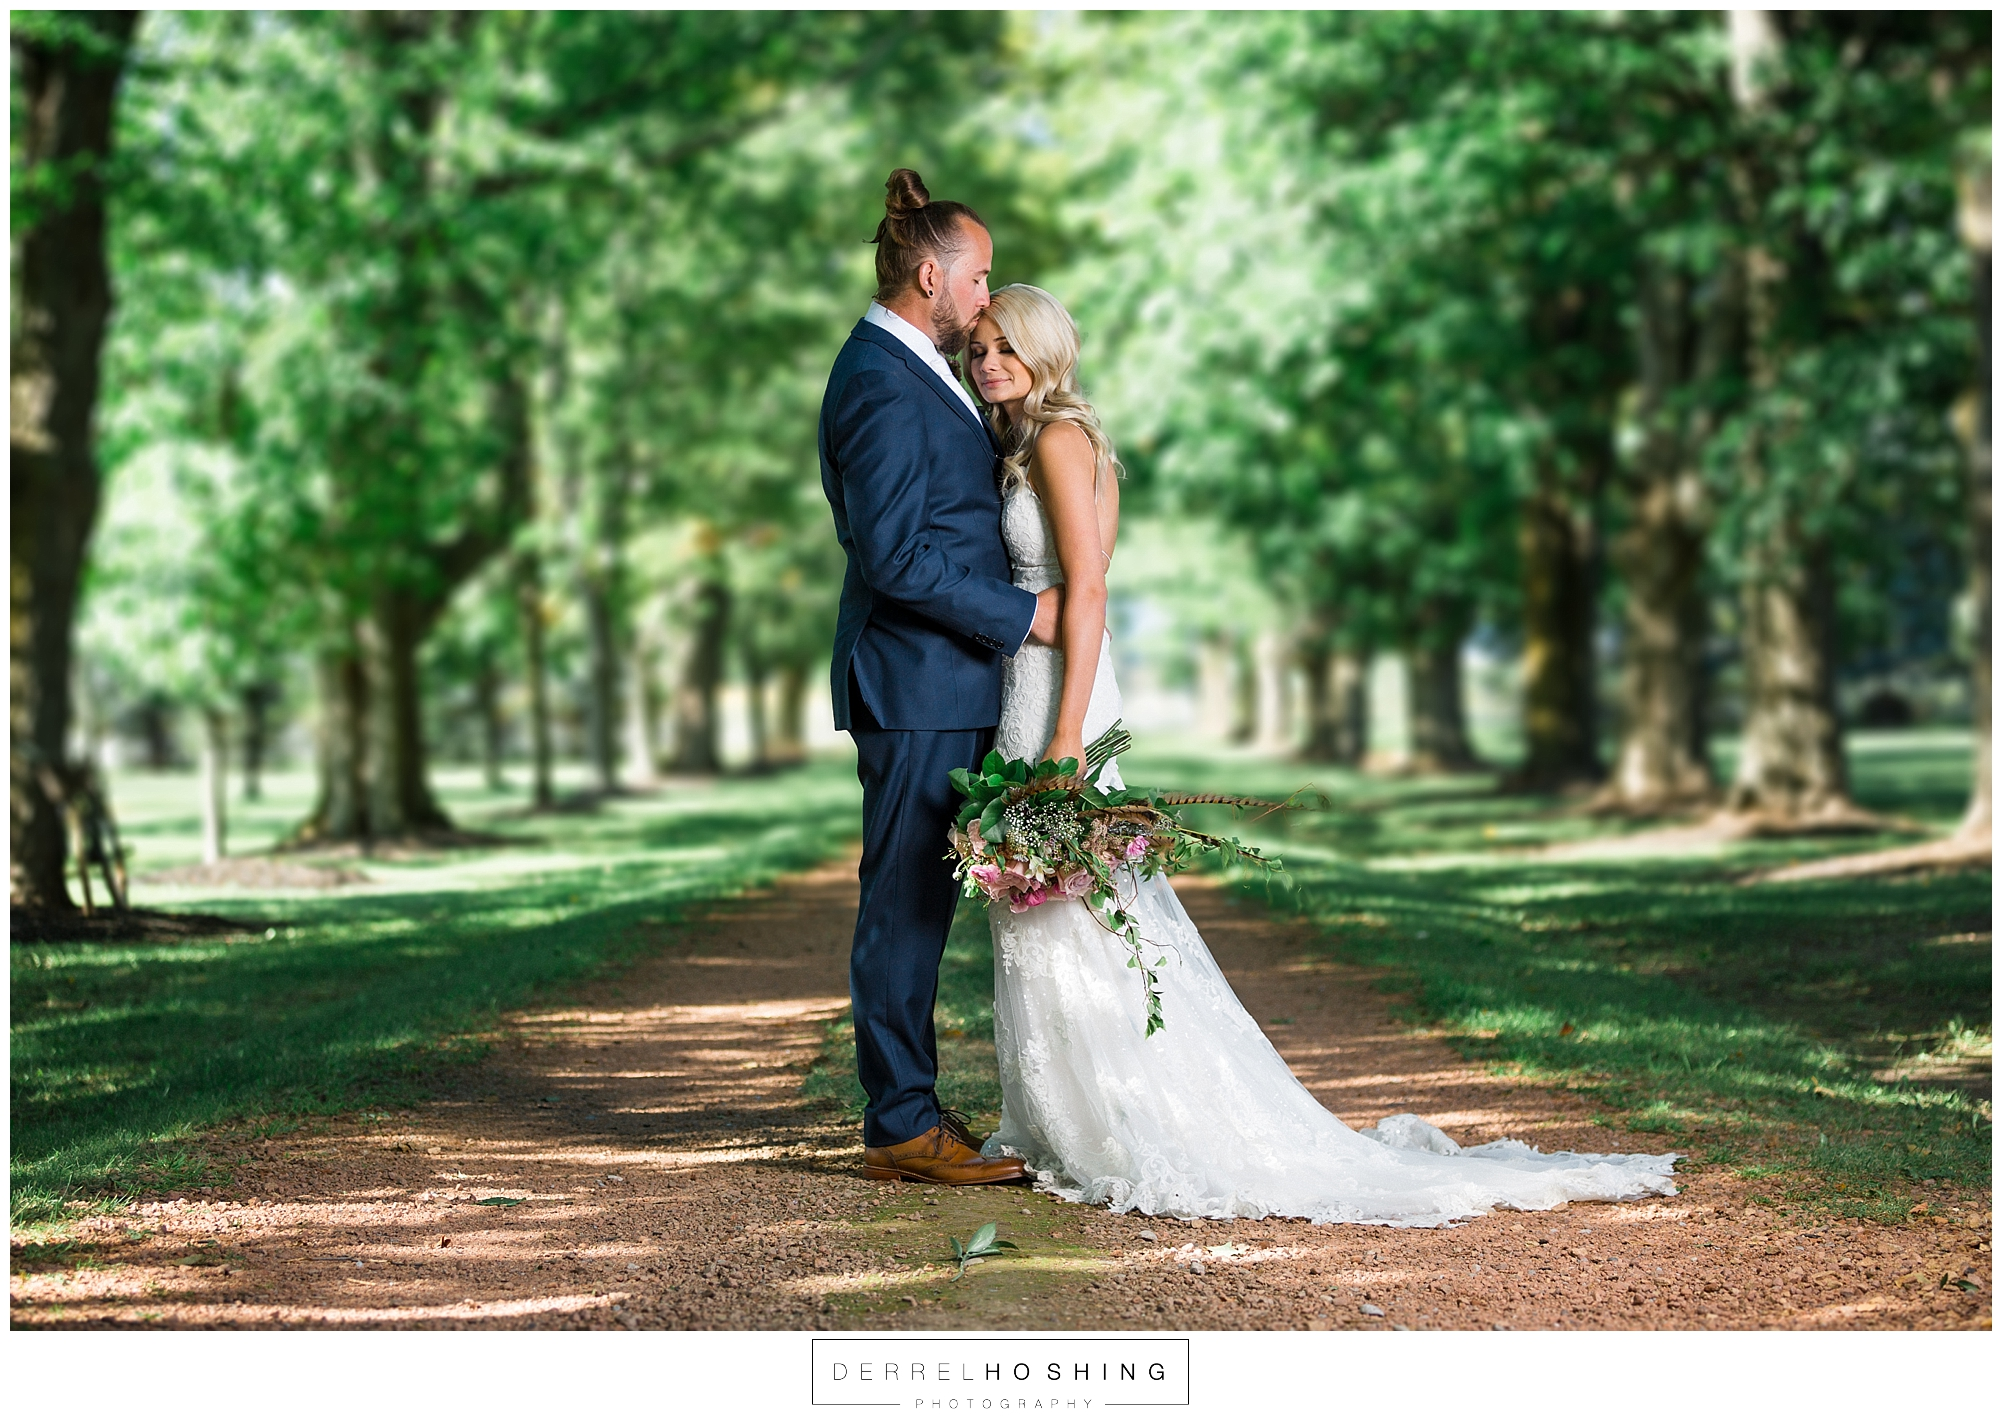 Belcroft-Estates-&-Event-Centre-Wedding-Innisfil-Ontario-0014.jpg